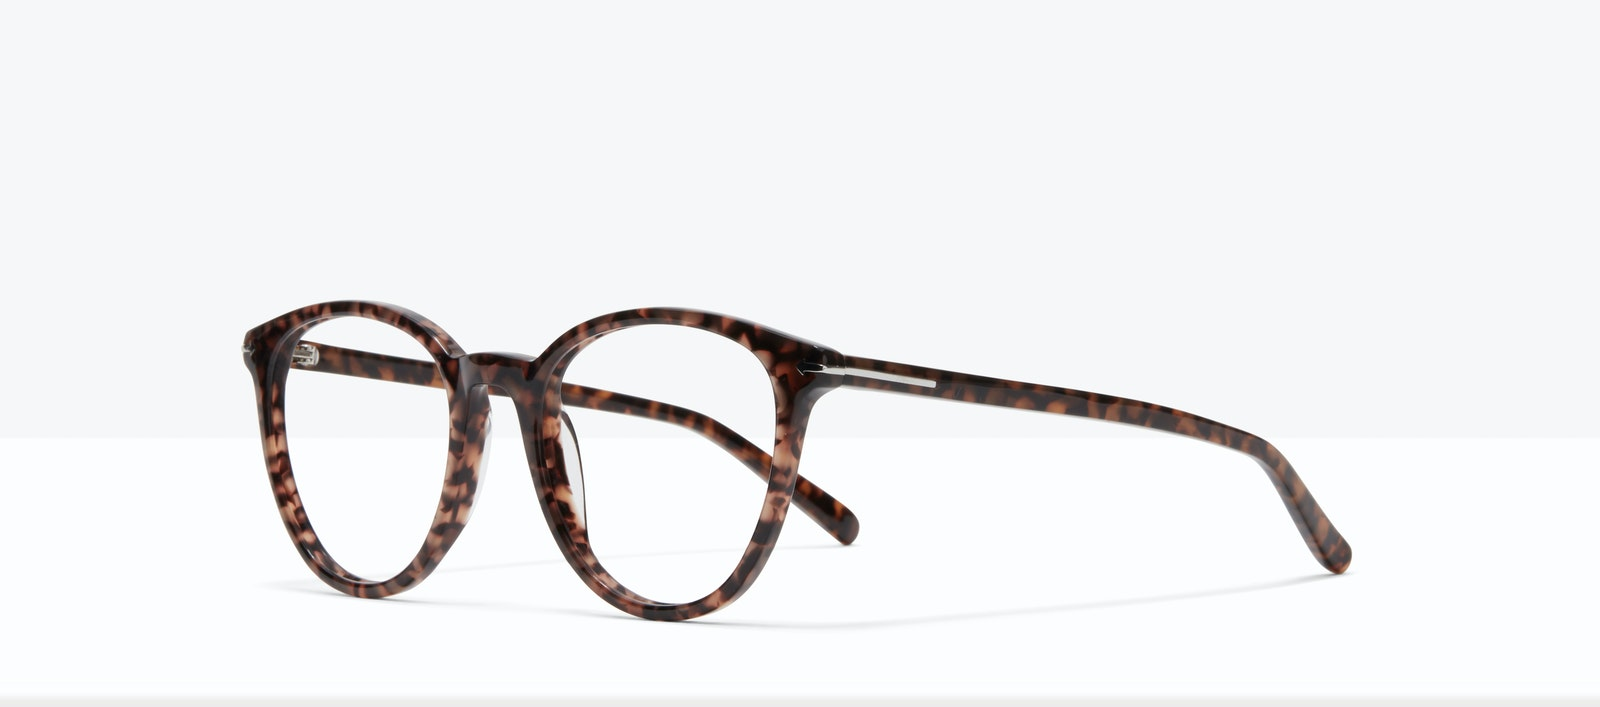 Affordable Fashion Glasses Round Eyeglasses Women London Leo Tilt